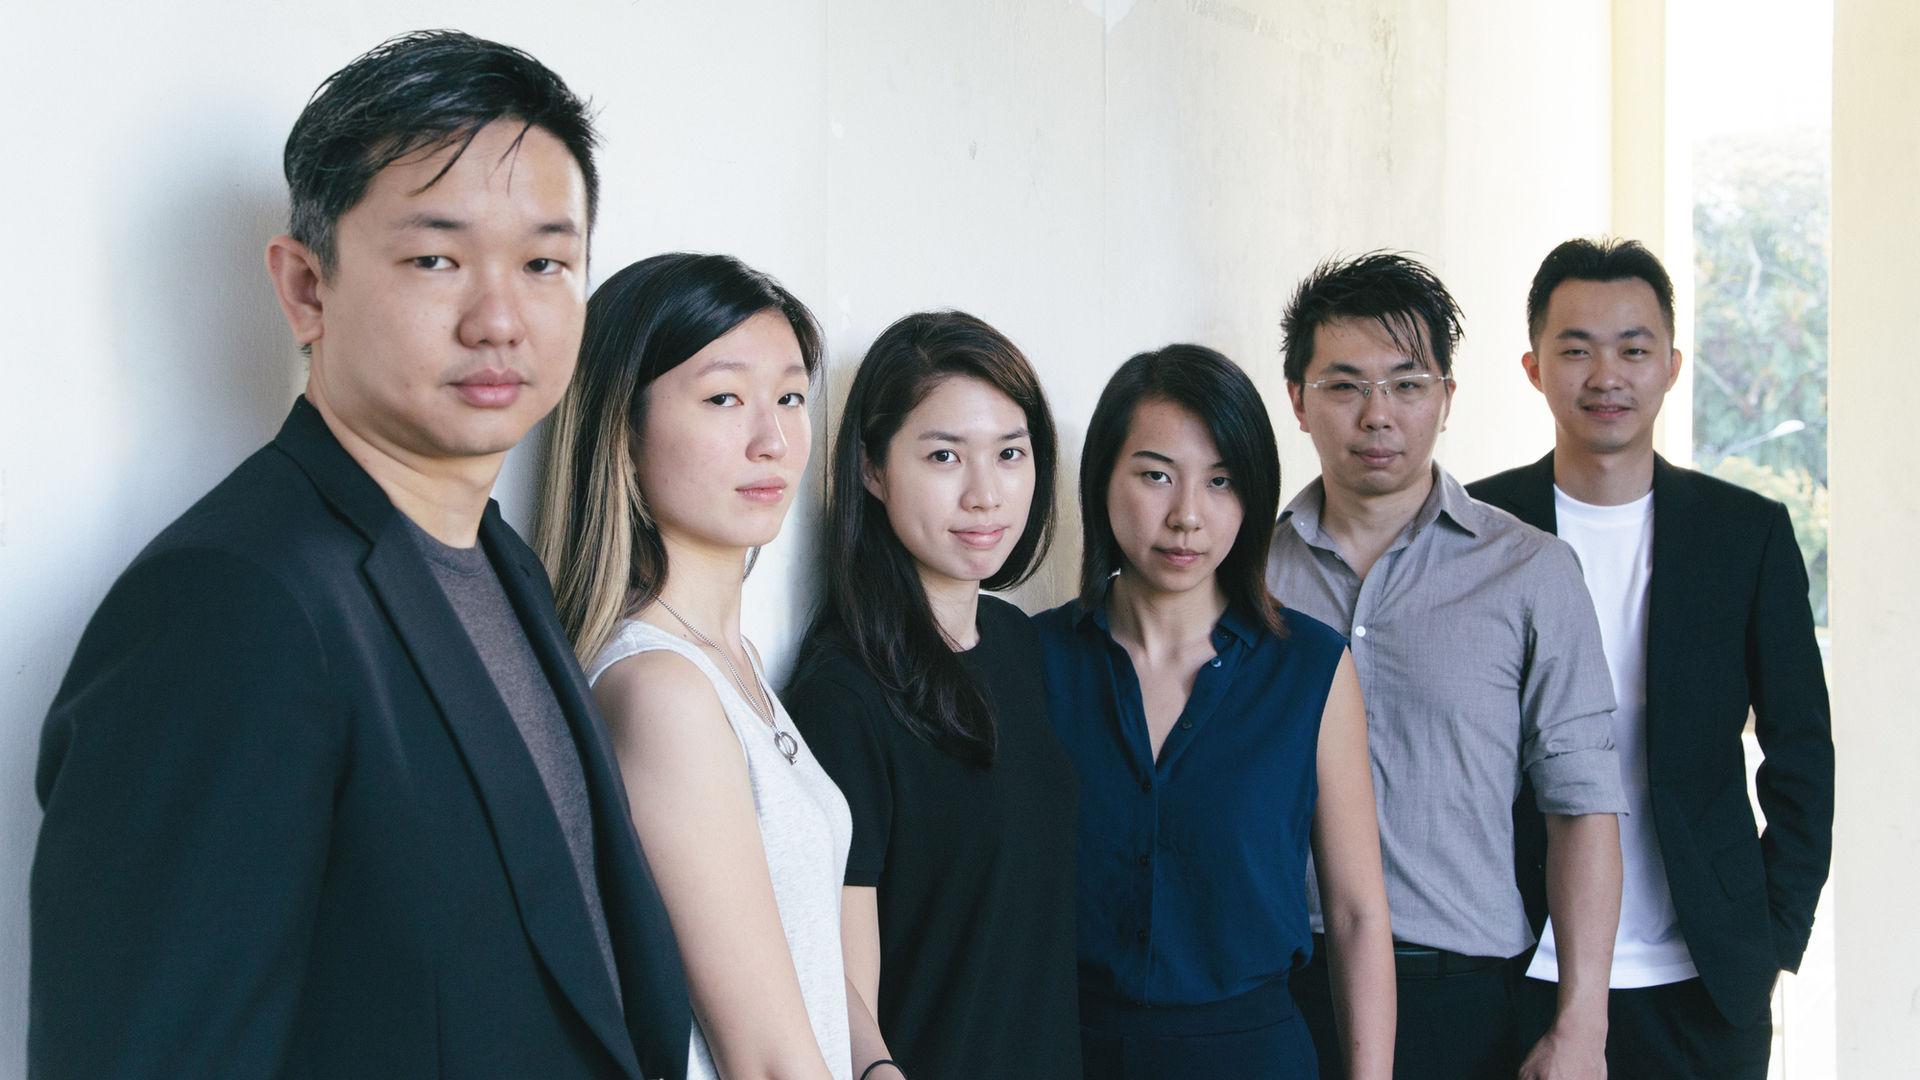 8.1.3 Group Photo 3 - 《华乐新生代》 - A Bigger